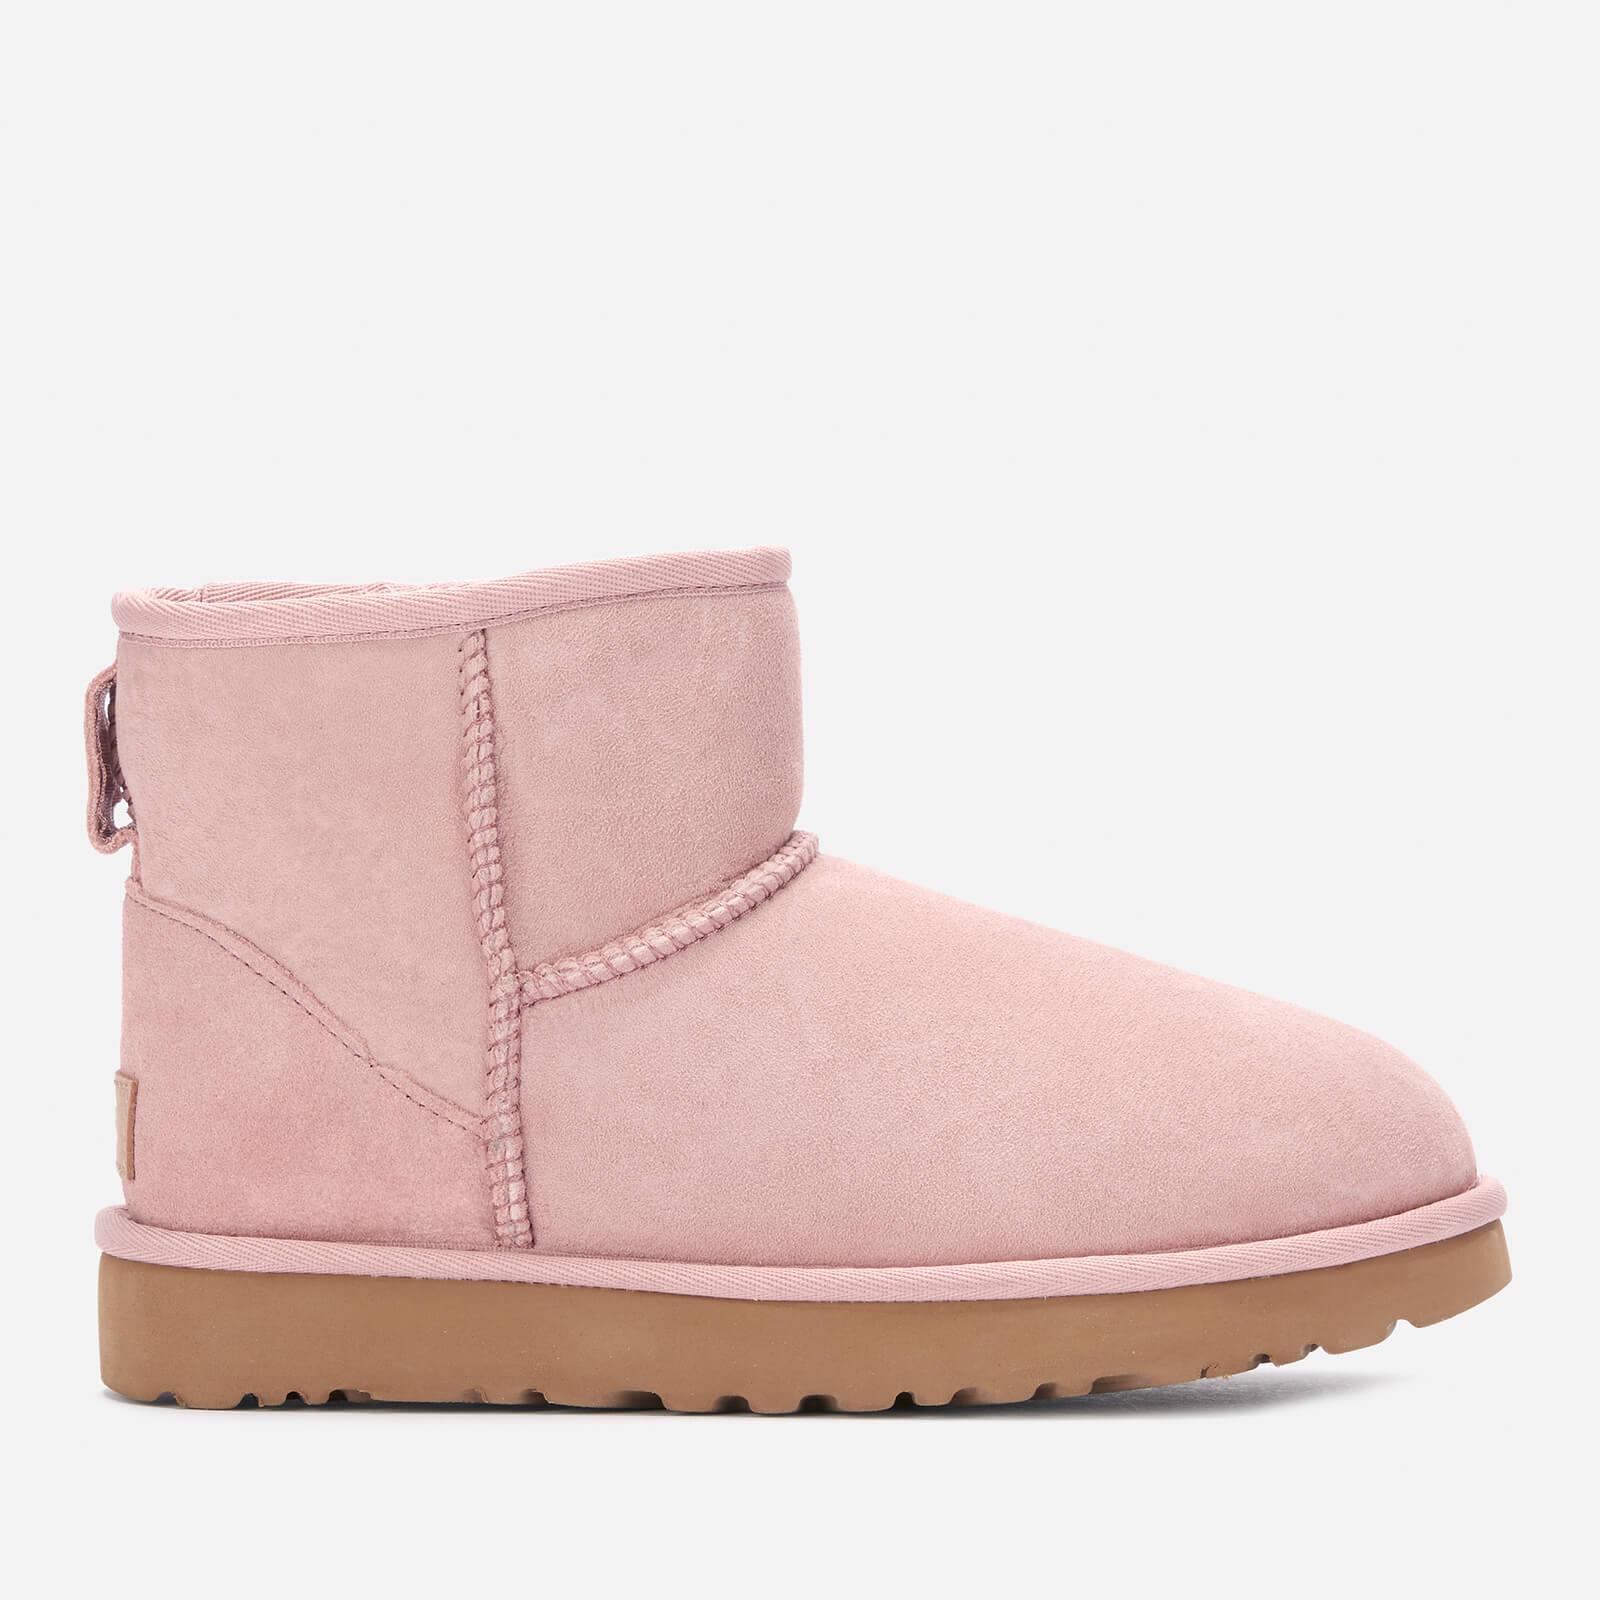 UGG Women's Classic Mini II Sheepskin Boots - Pink Crystal - UK 7